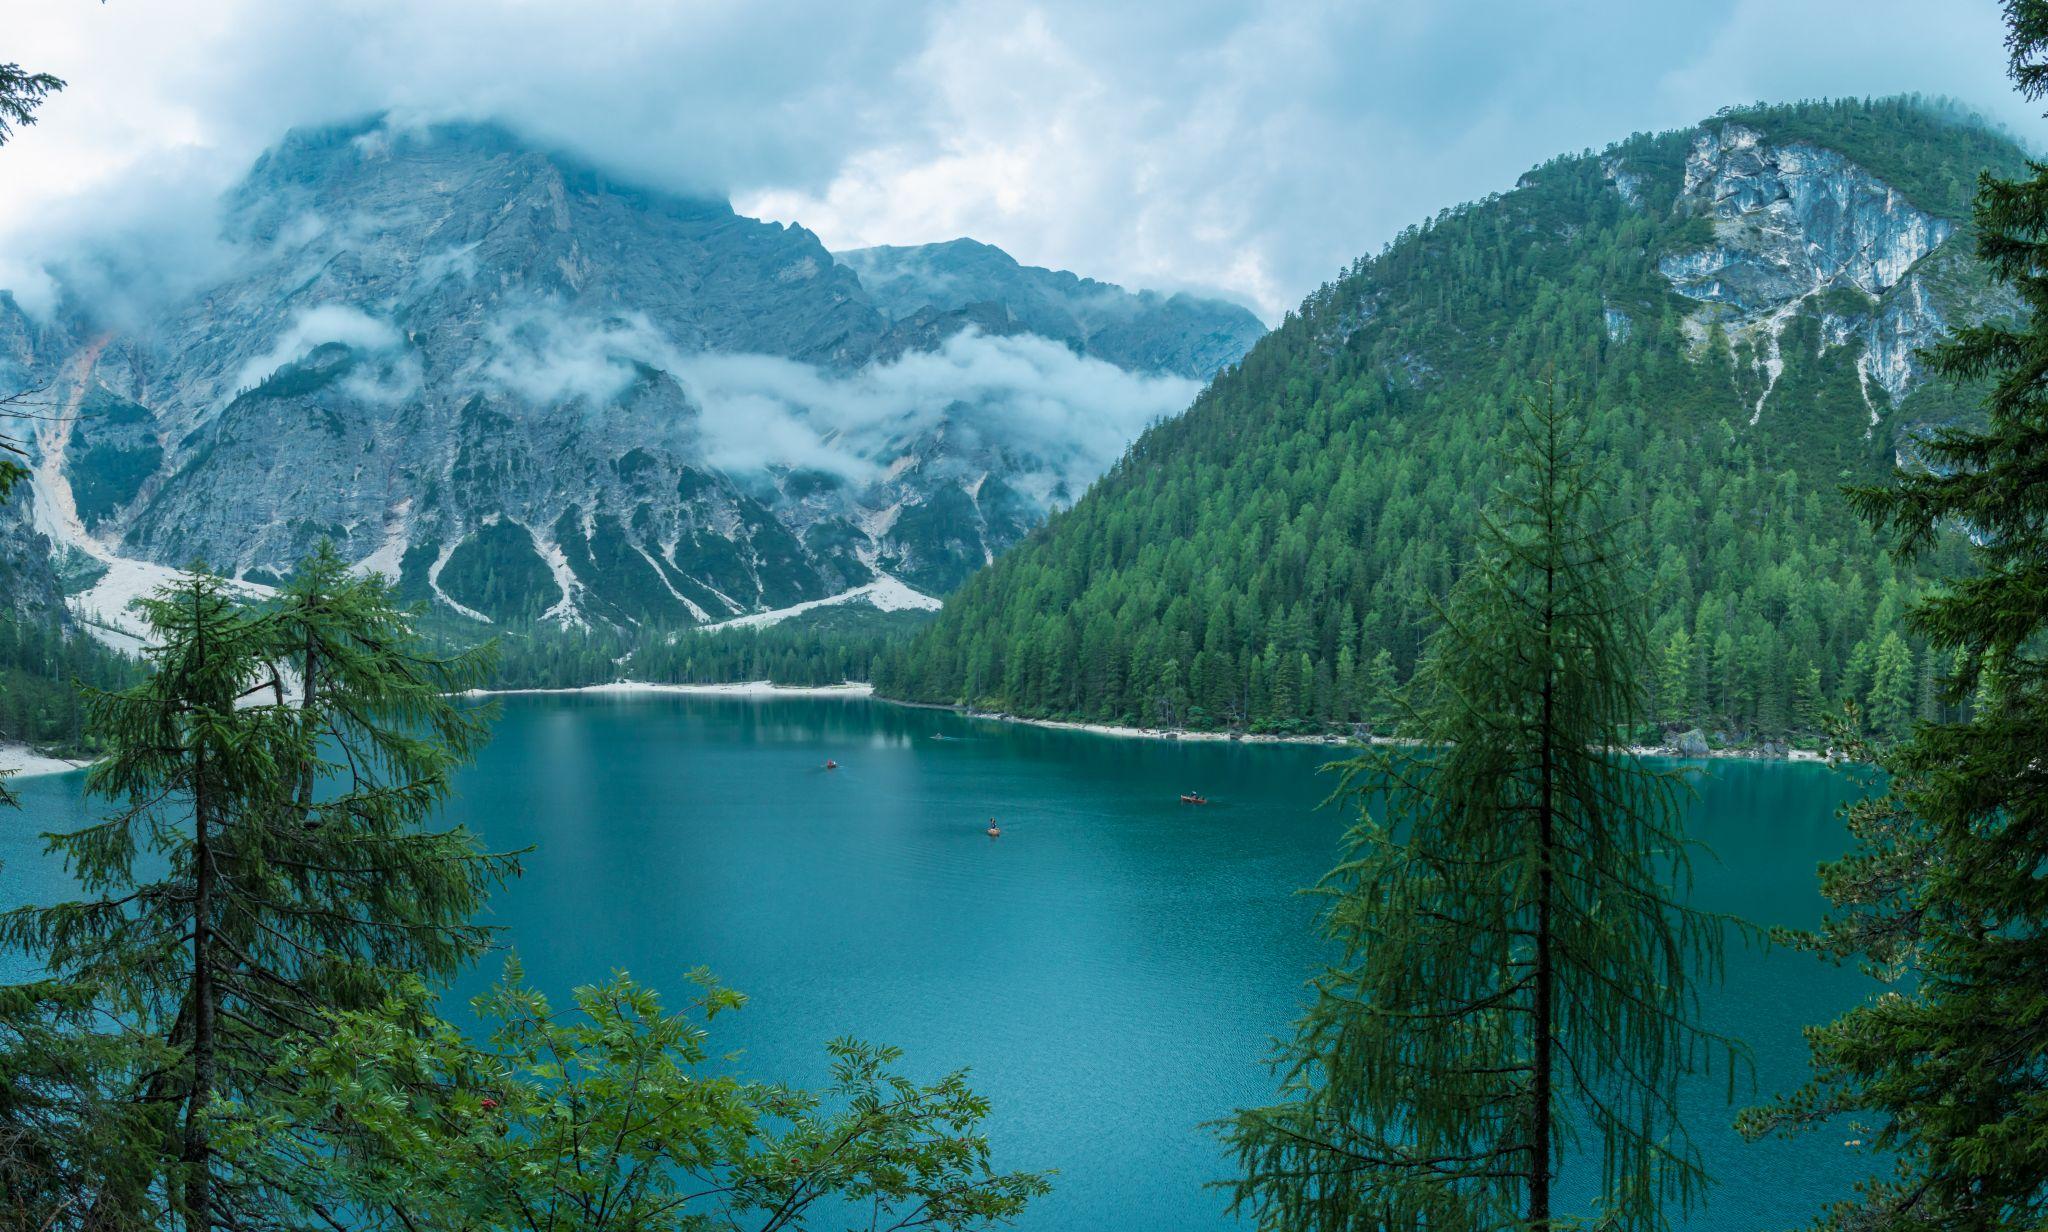 Pragser Wildsee / Lago di Braies, Italy